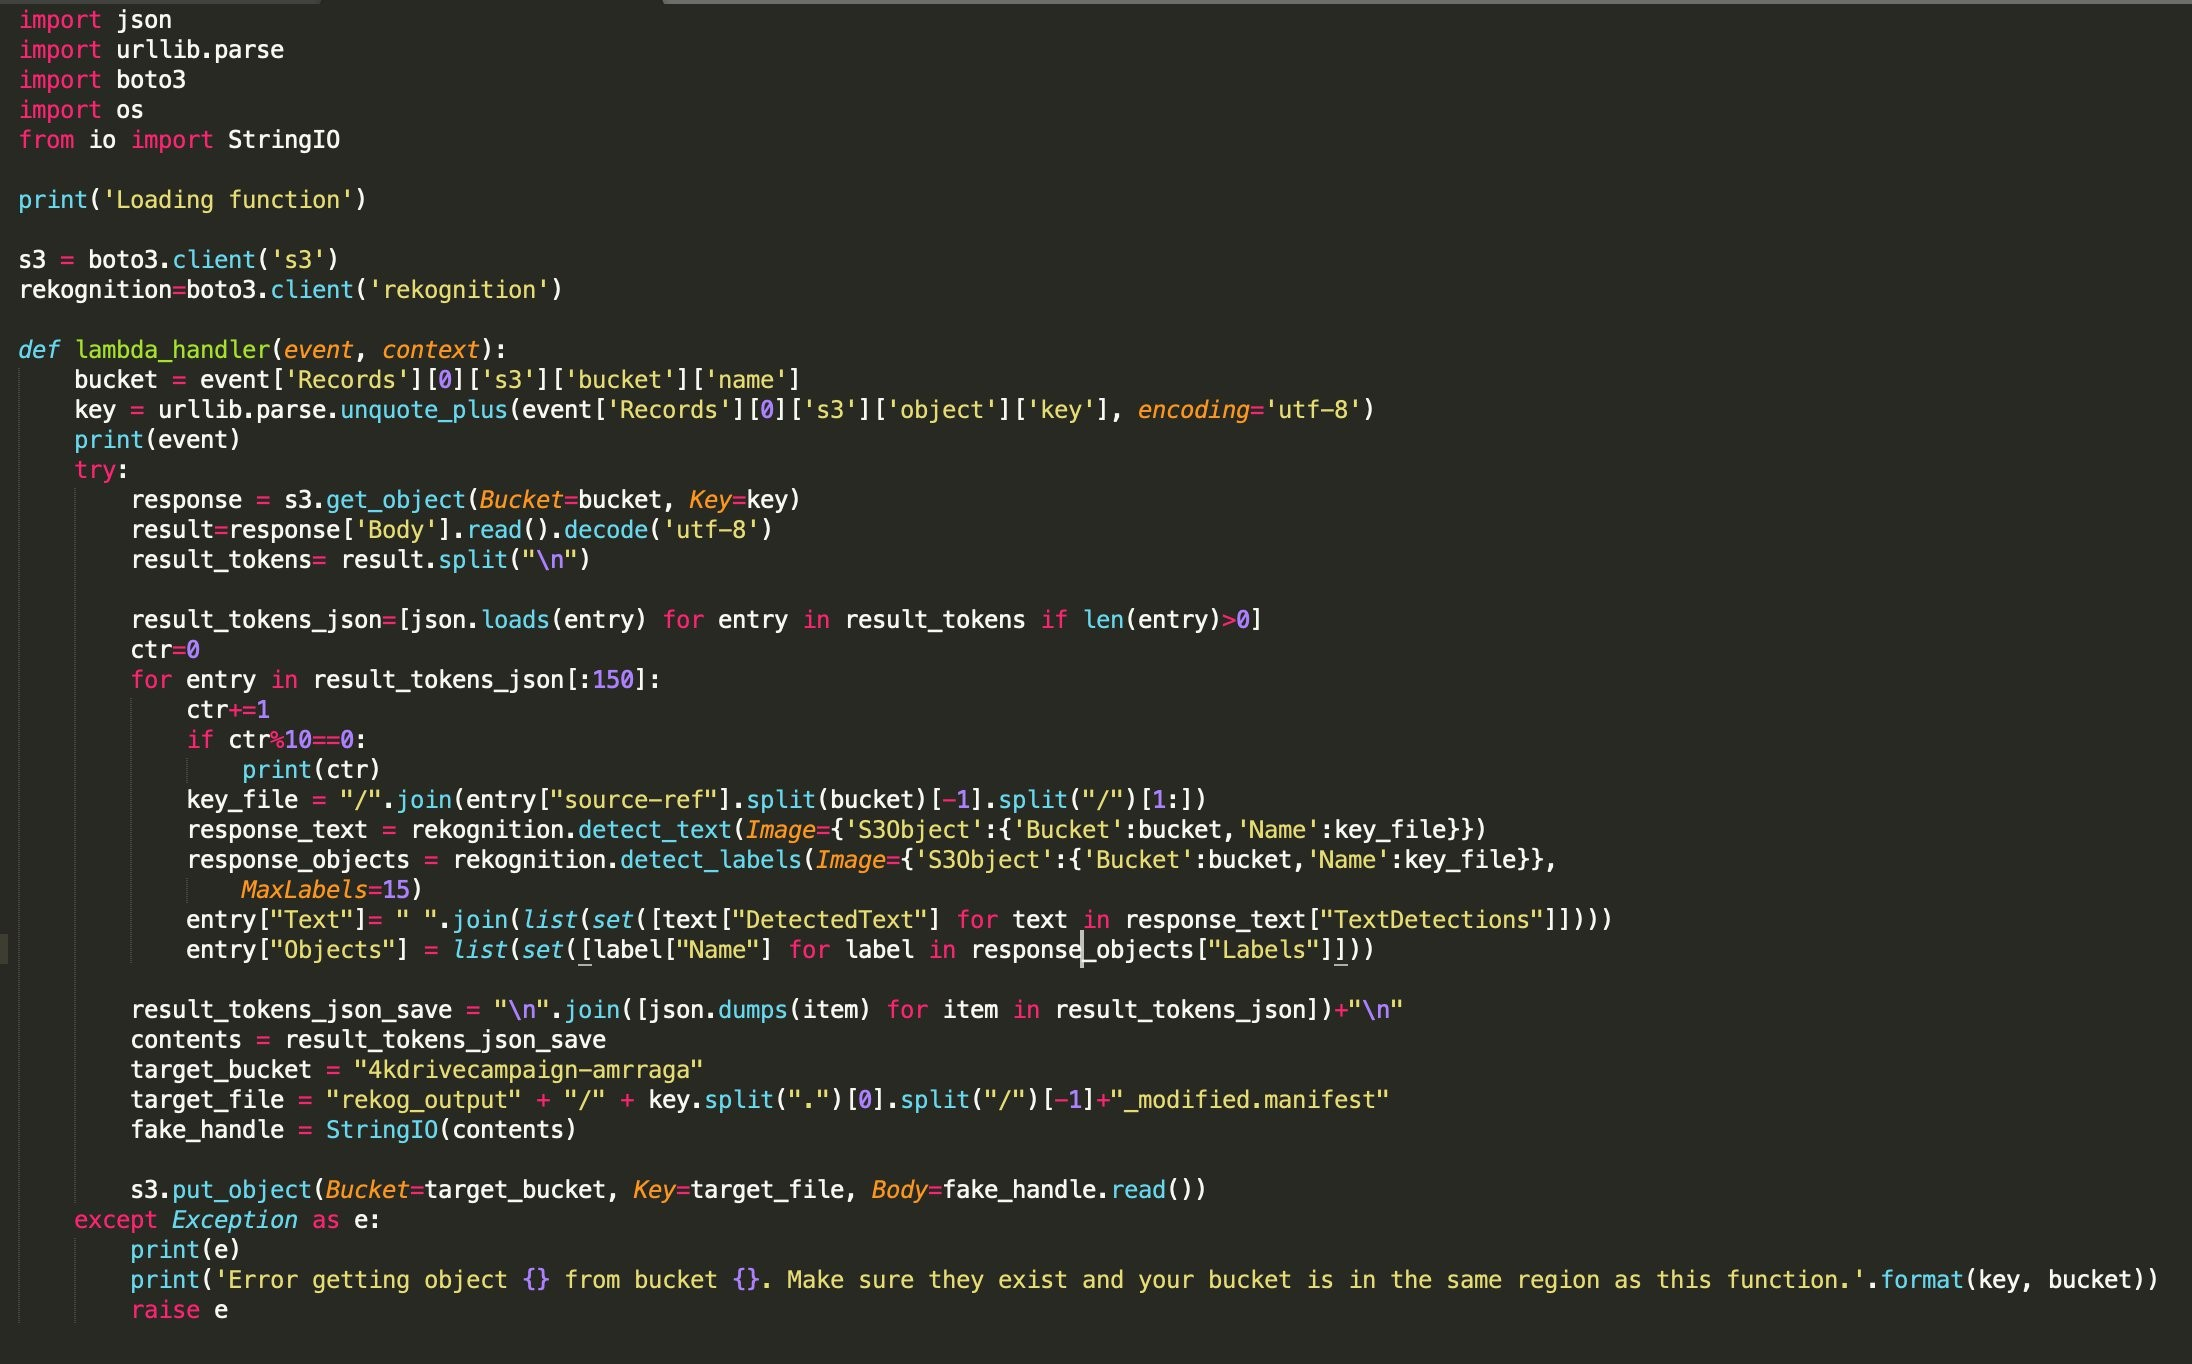 Preparing image metadata using Amazon Rekognition